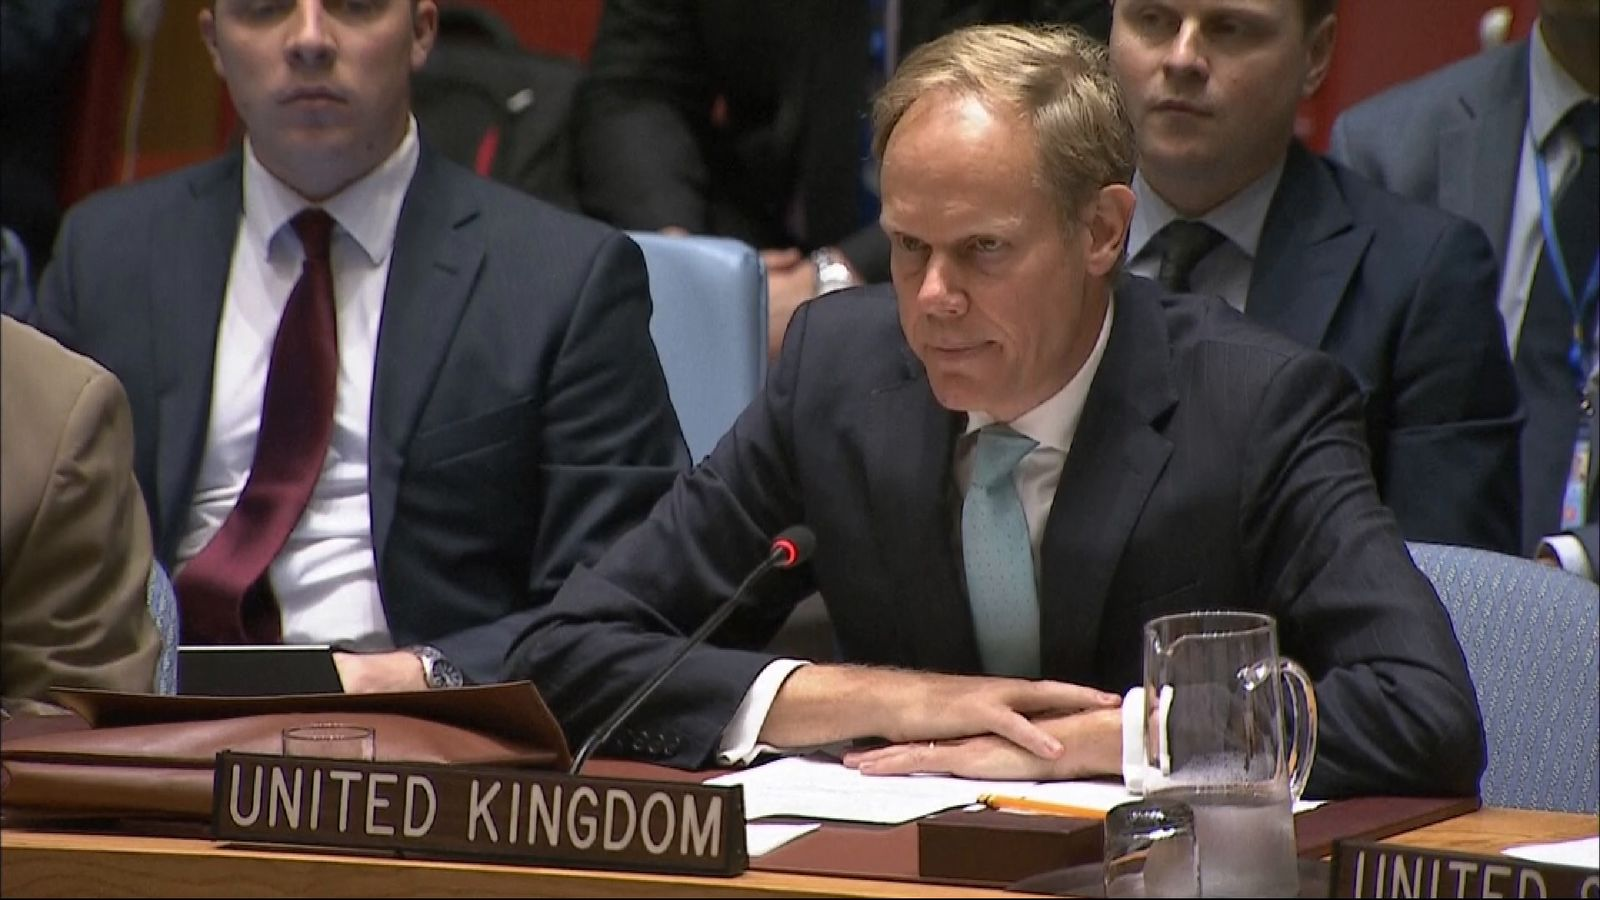 Britain's ambassador to the UN has accused Russia  of war crimes in Syria.